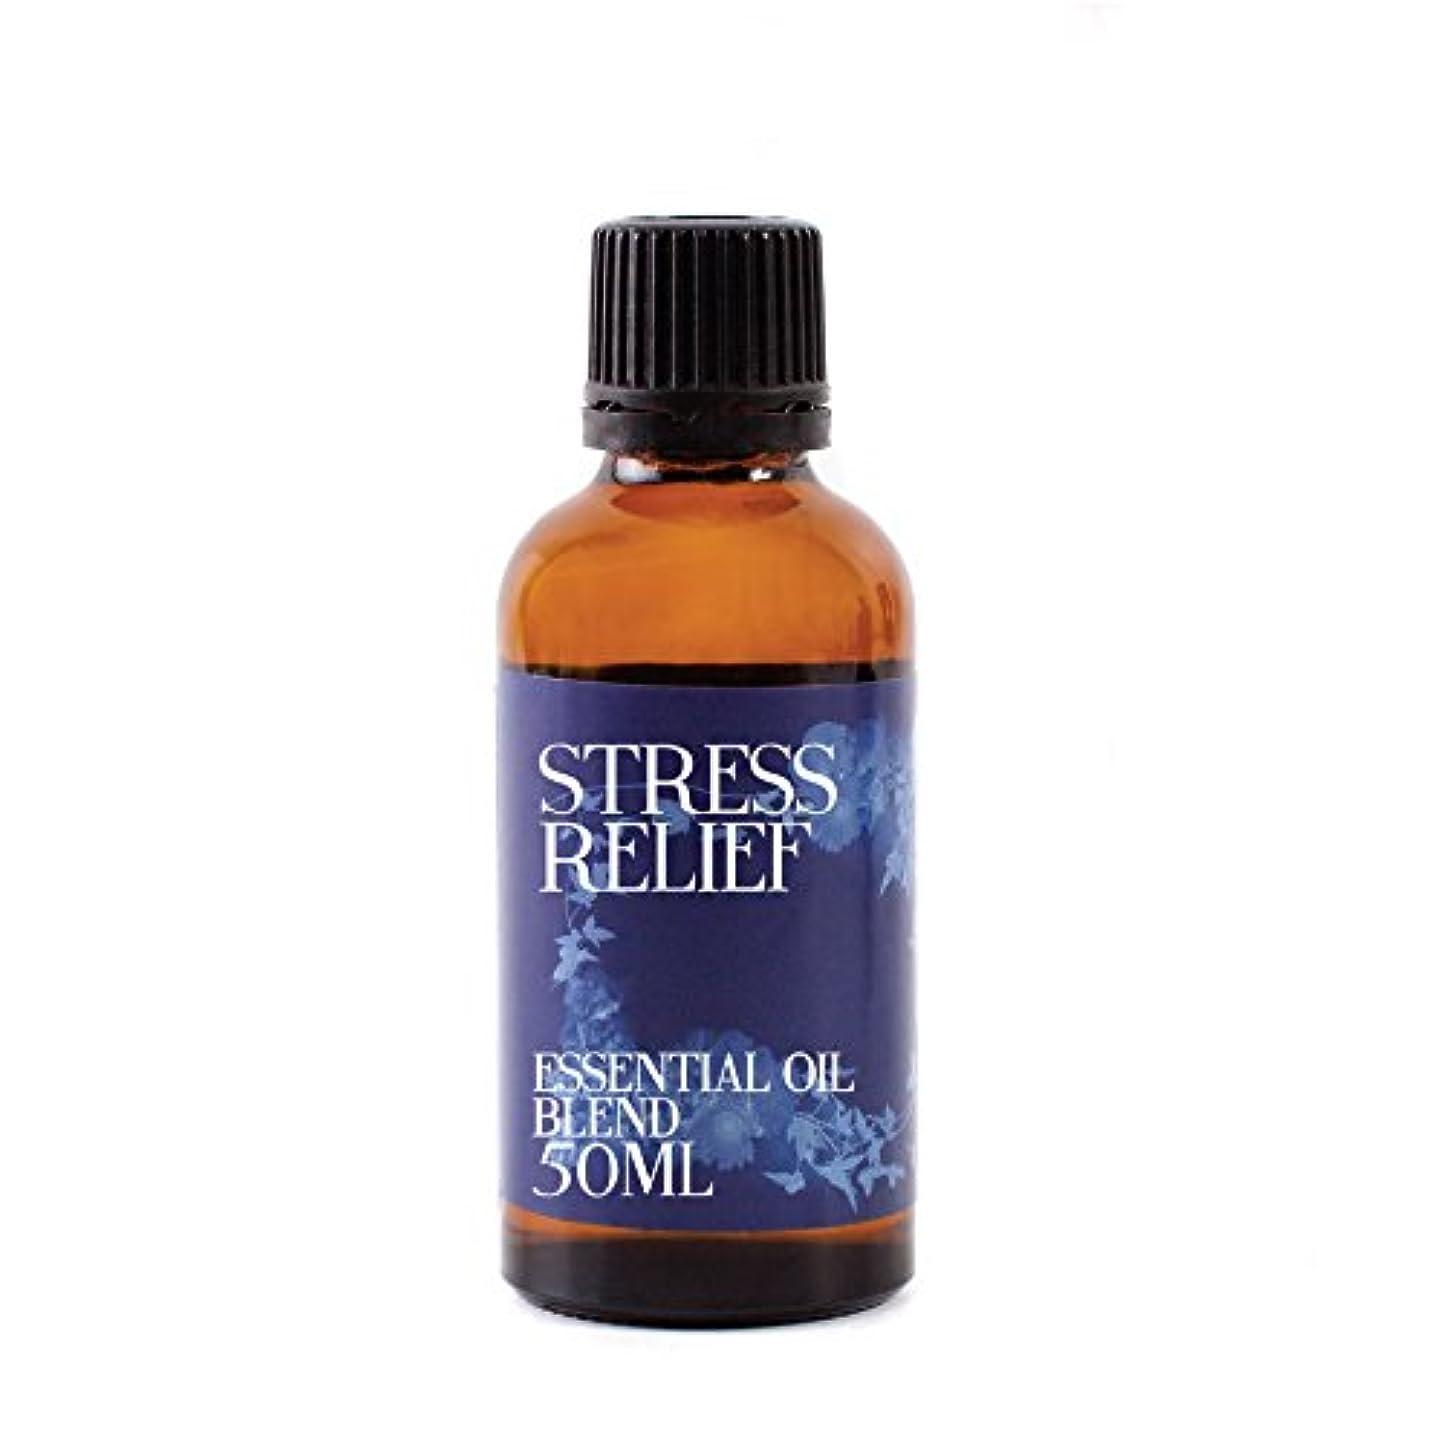 恩赦船尾勤勉なMystix London | Stress Relief Essential Oil Blend - 50ml - 100% Pure